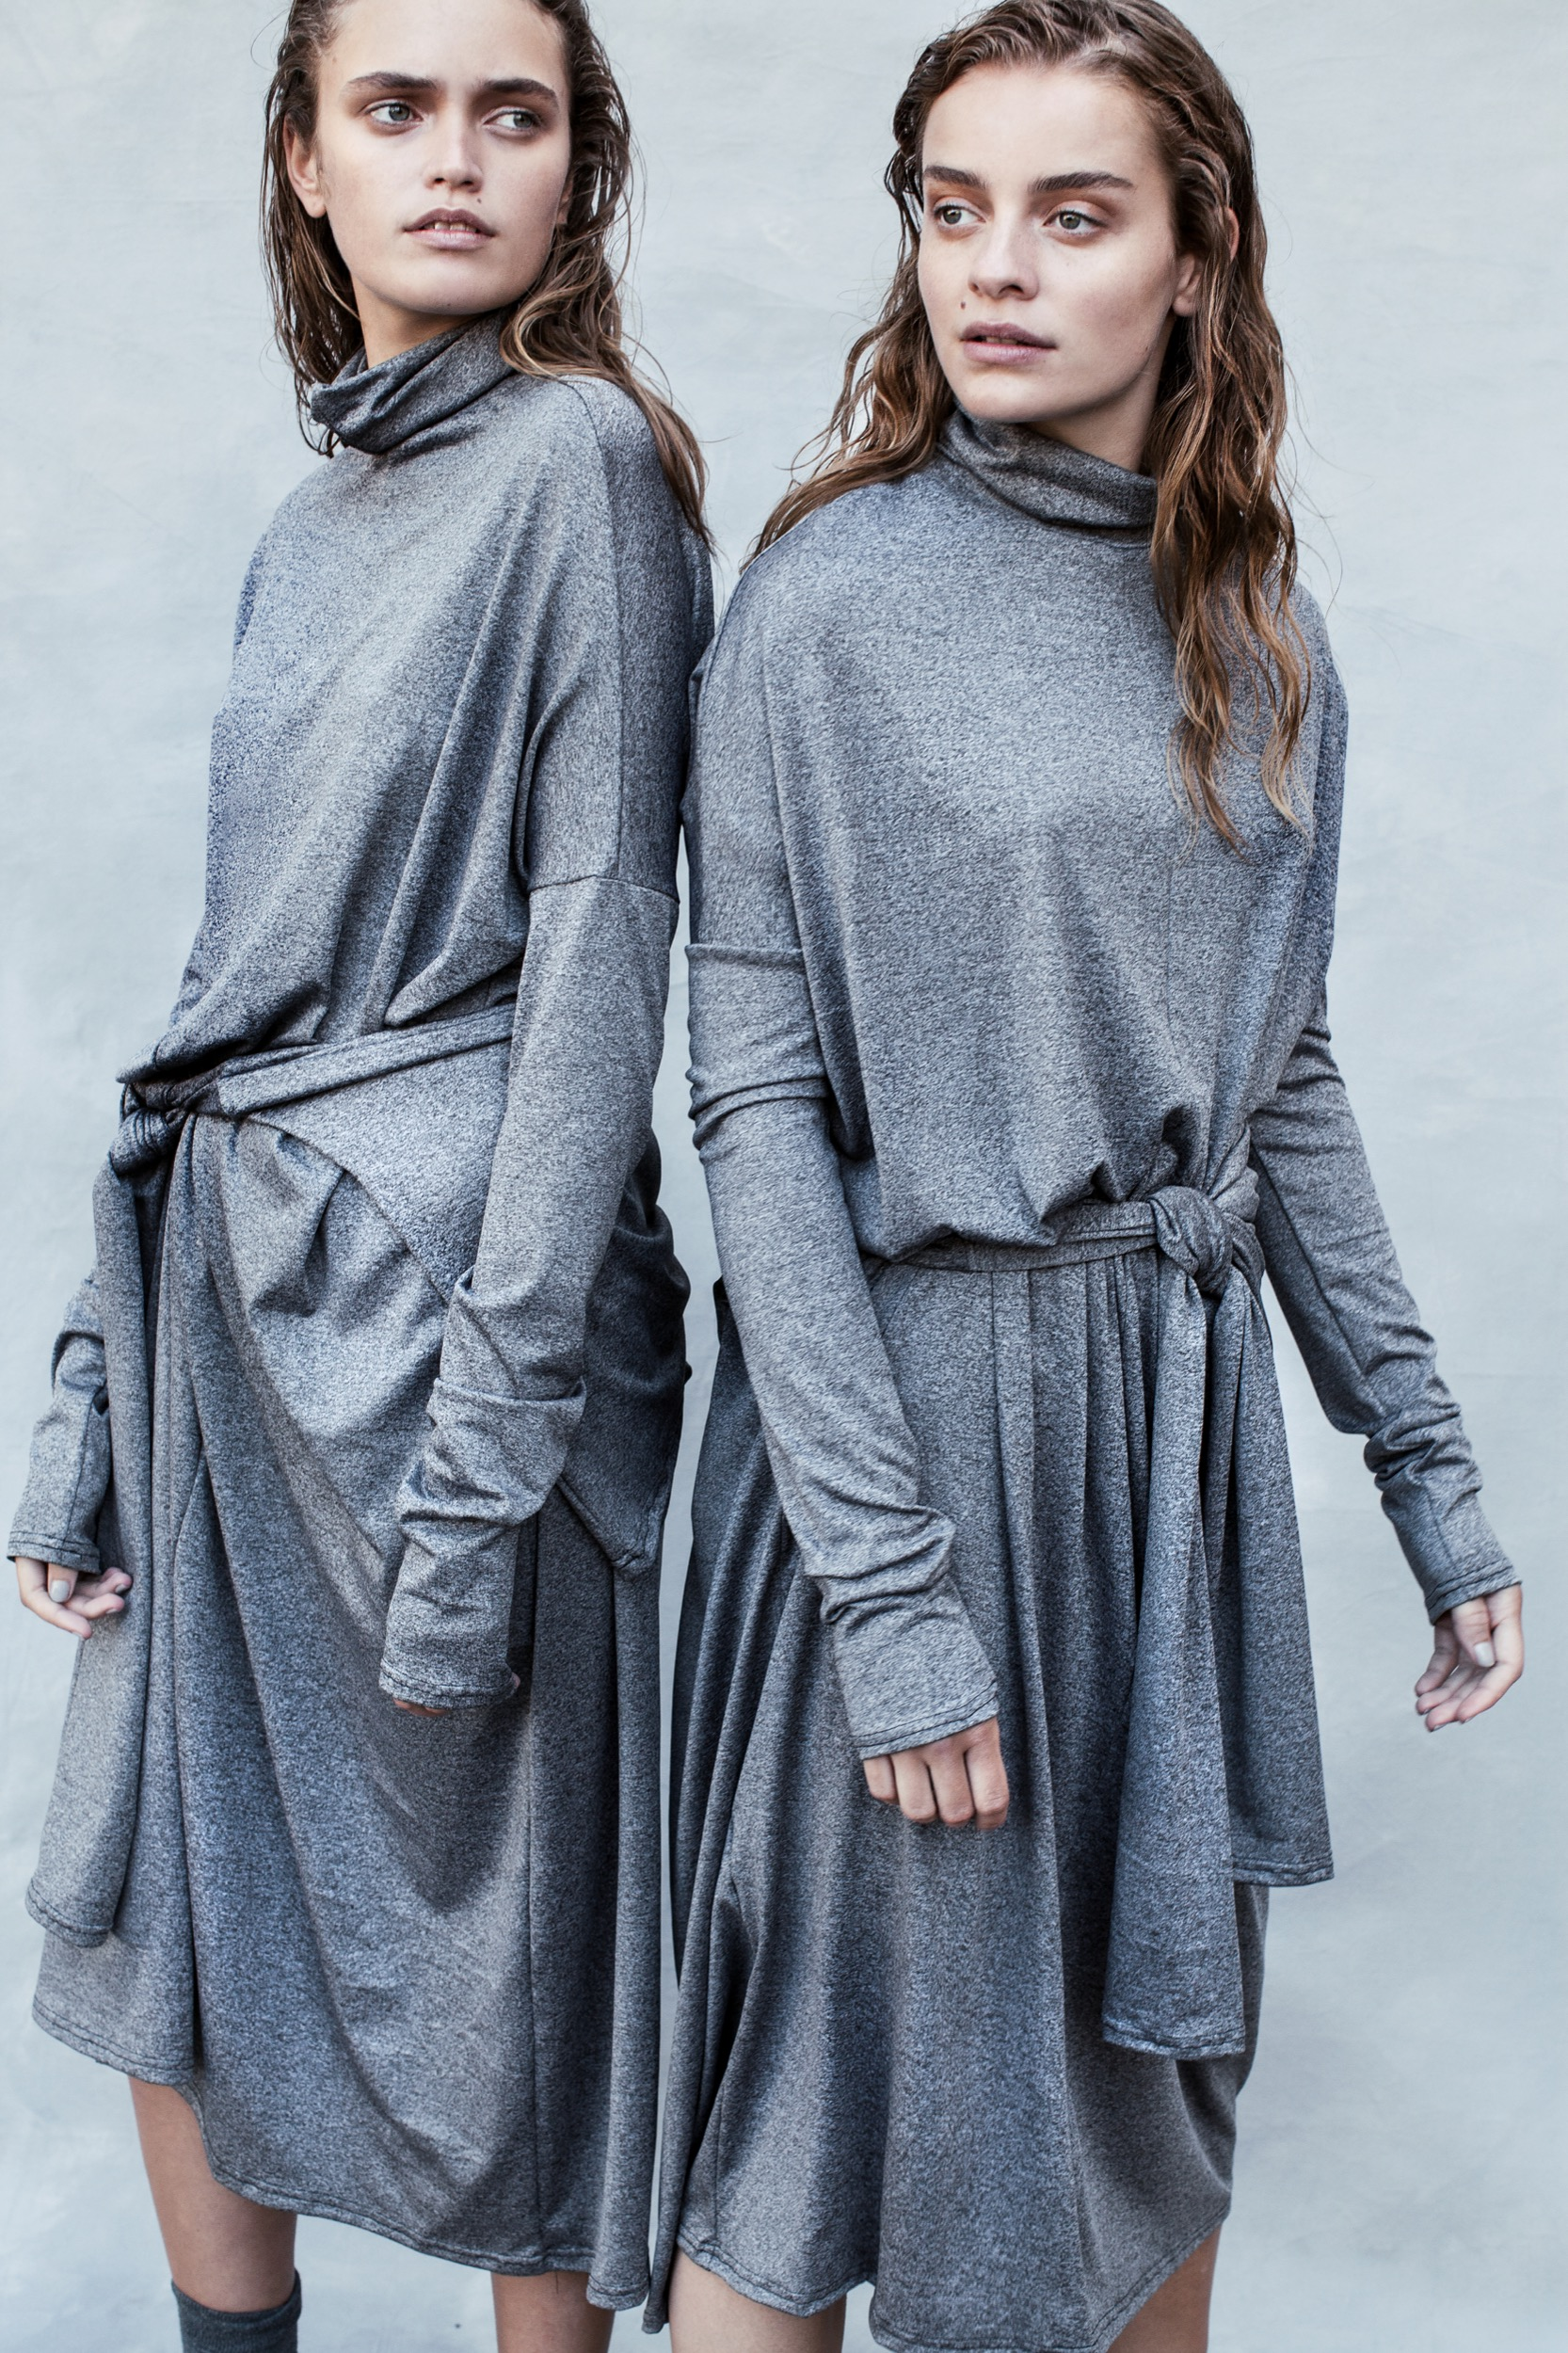 twins 4.jpg